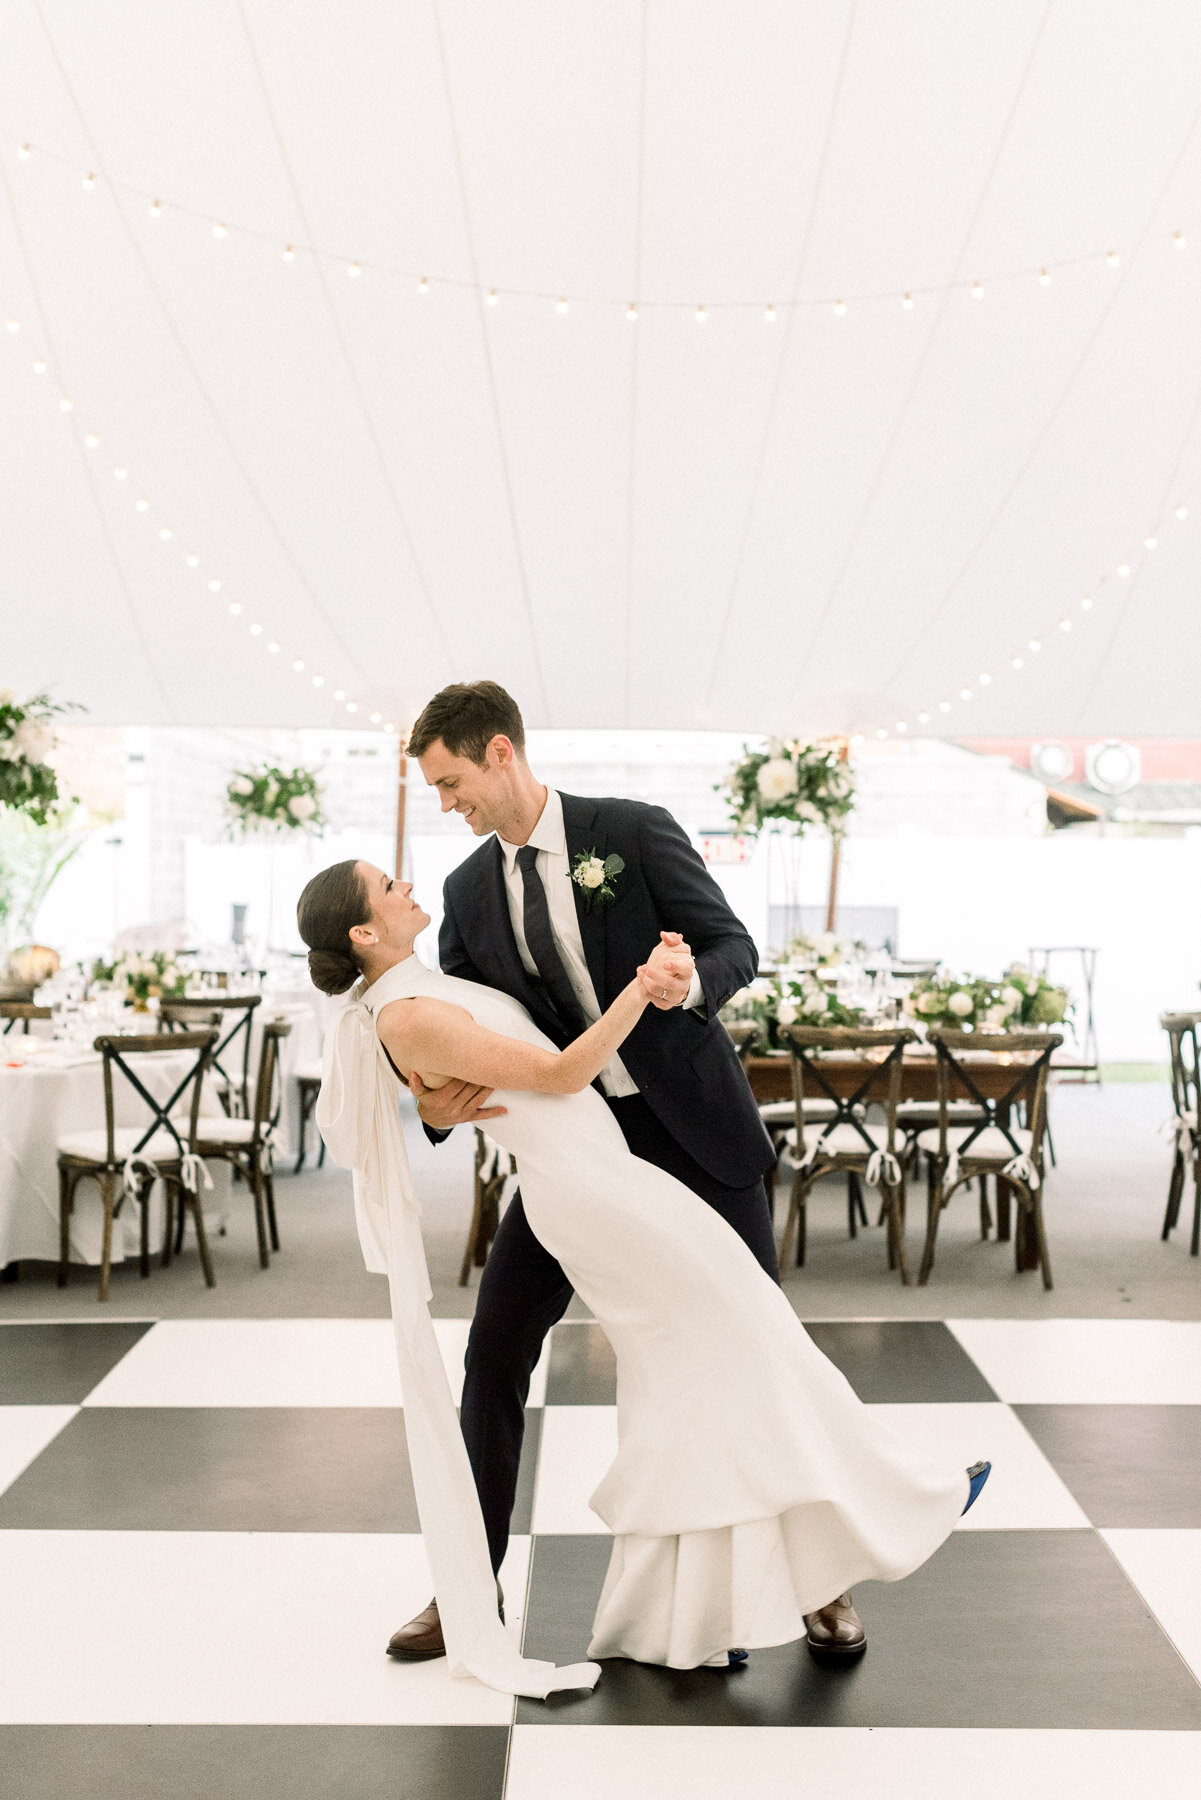 Adelphi Saratoga Wedding by Michelle Lange Photography-37.jpg